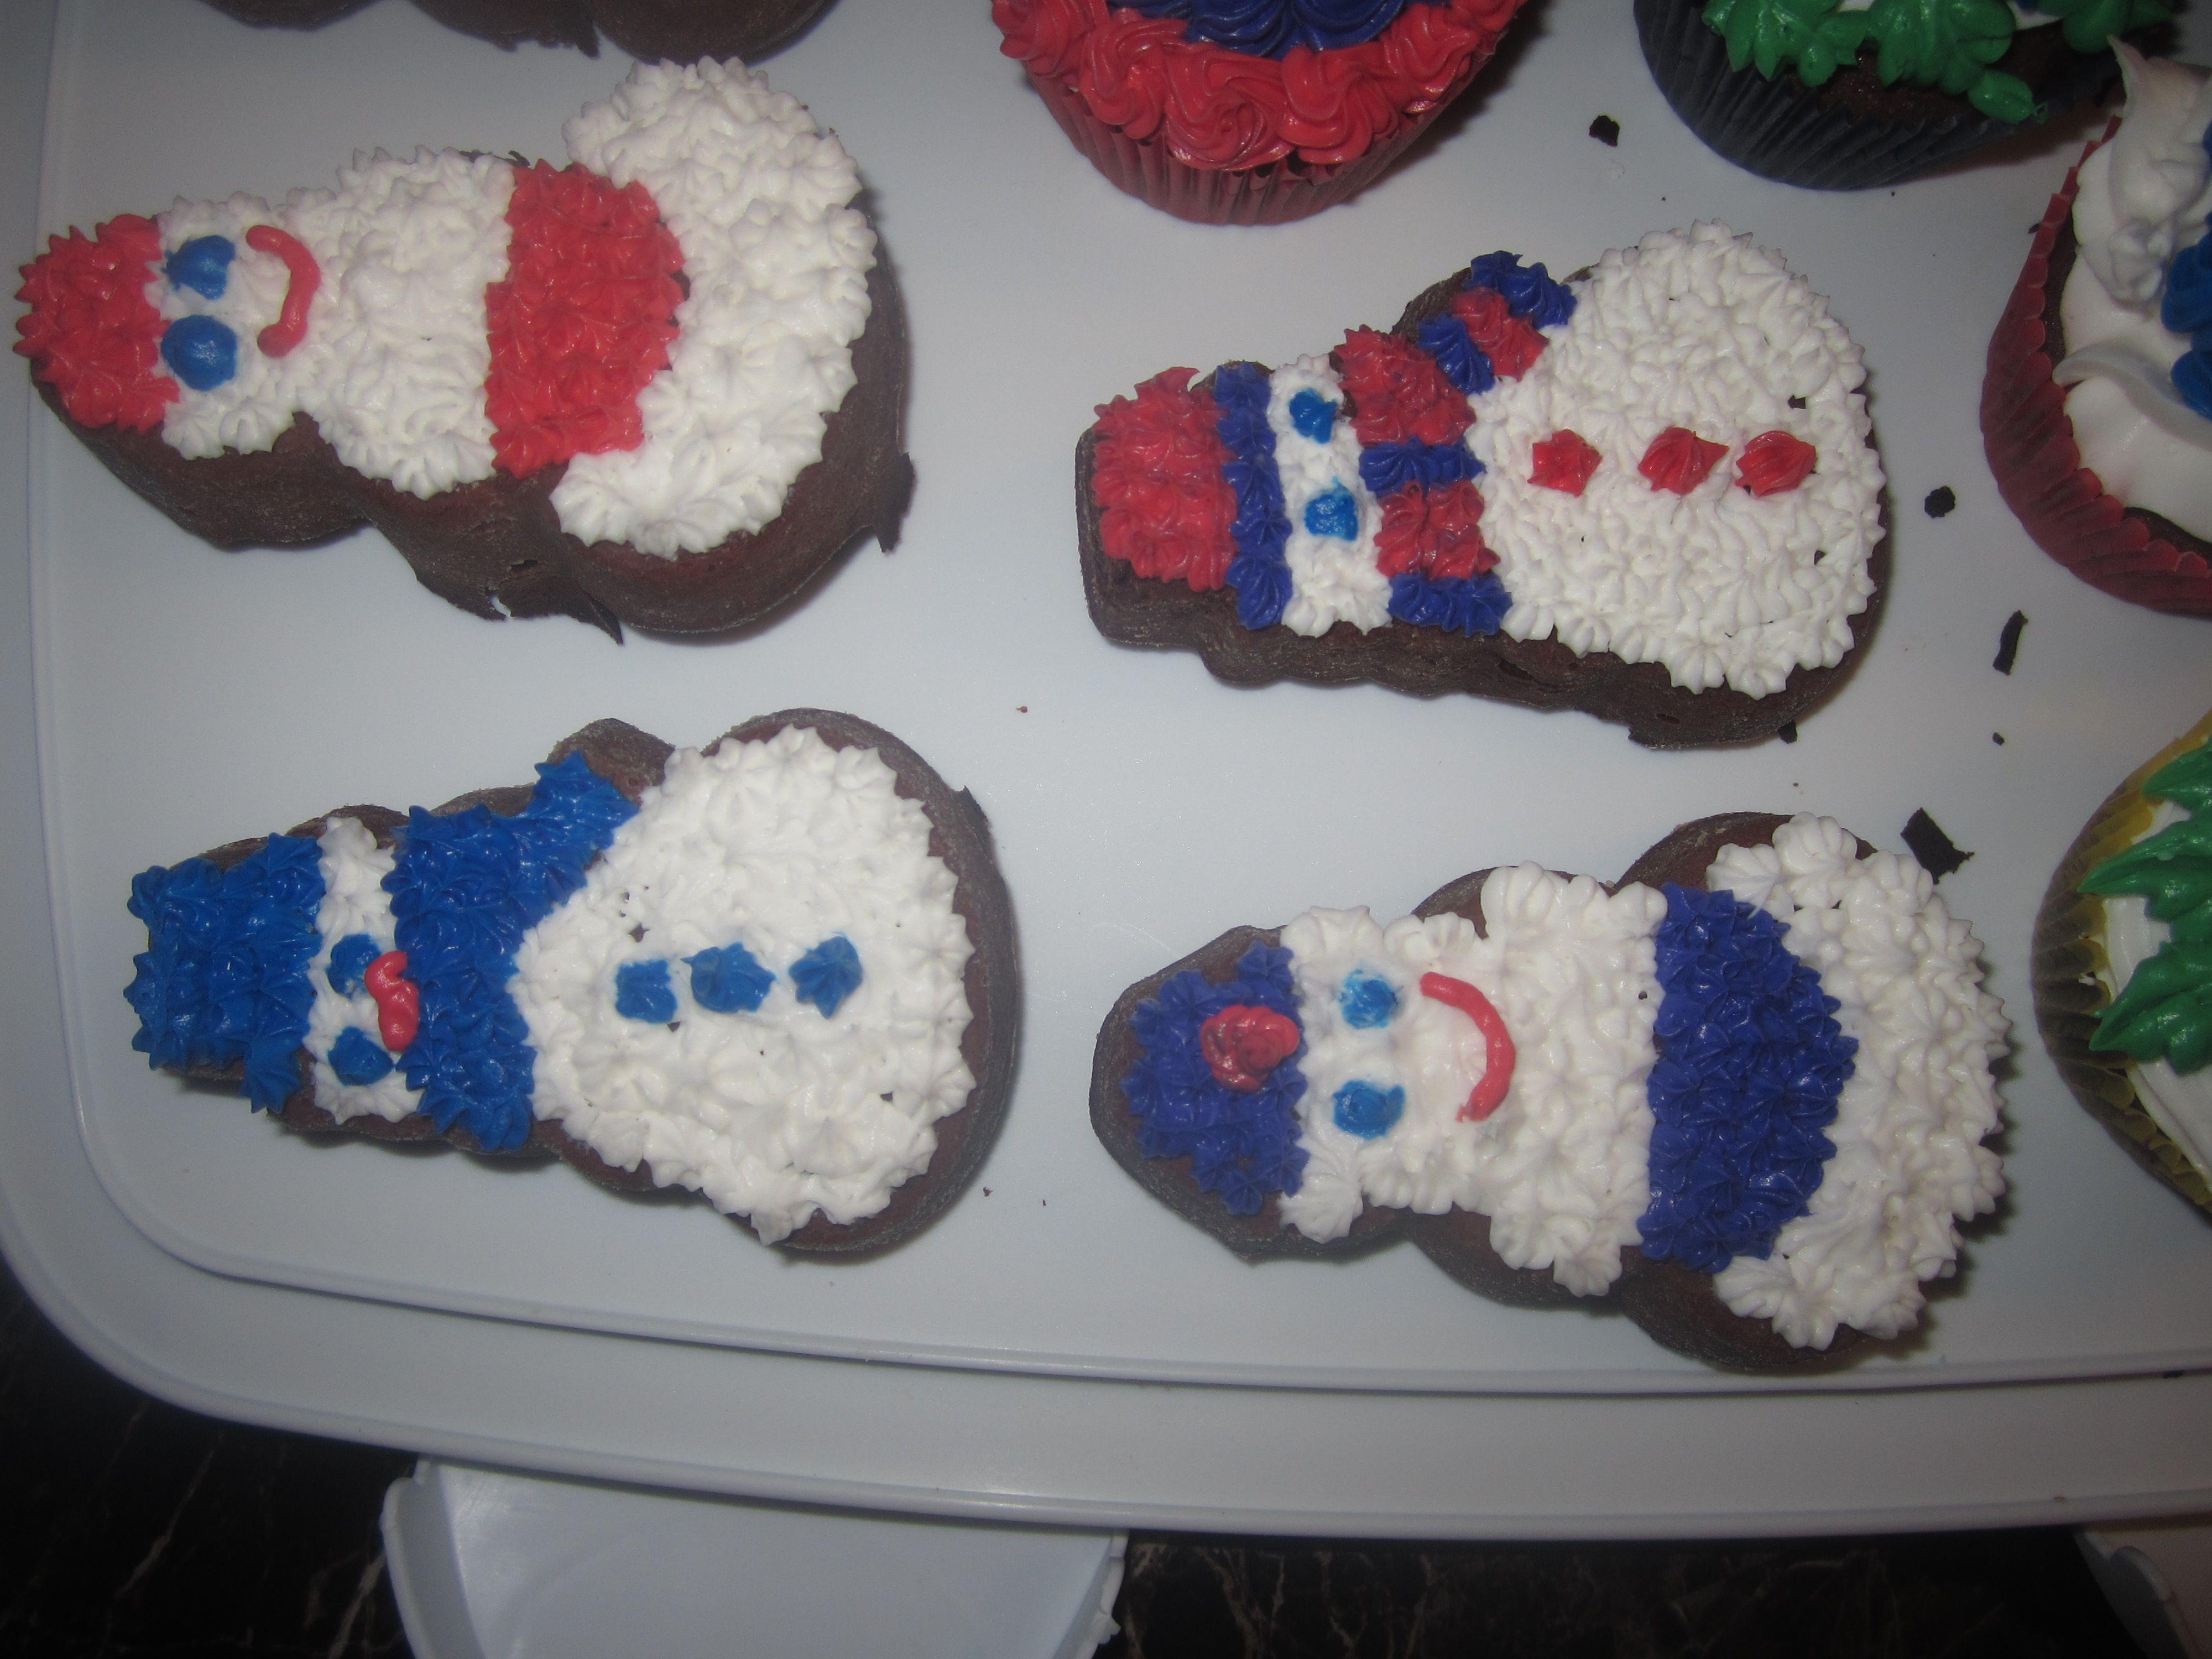 Snowman Minicakes